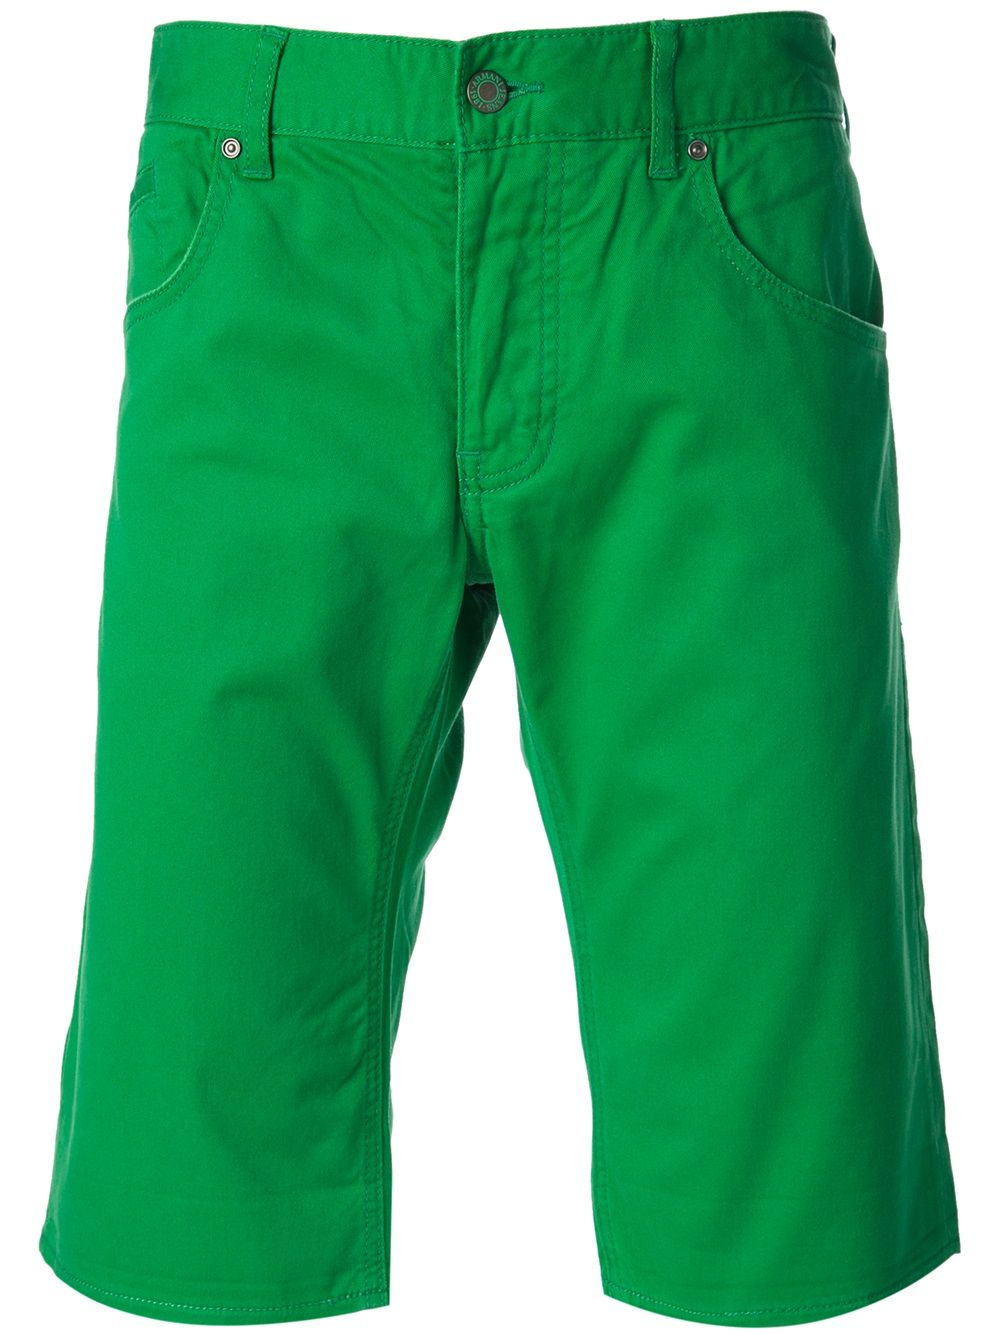 Armani Jeans Slim Low Rise Shorts | Men's Shorts | Pinterest